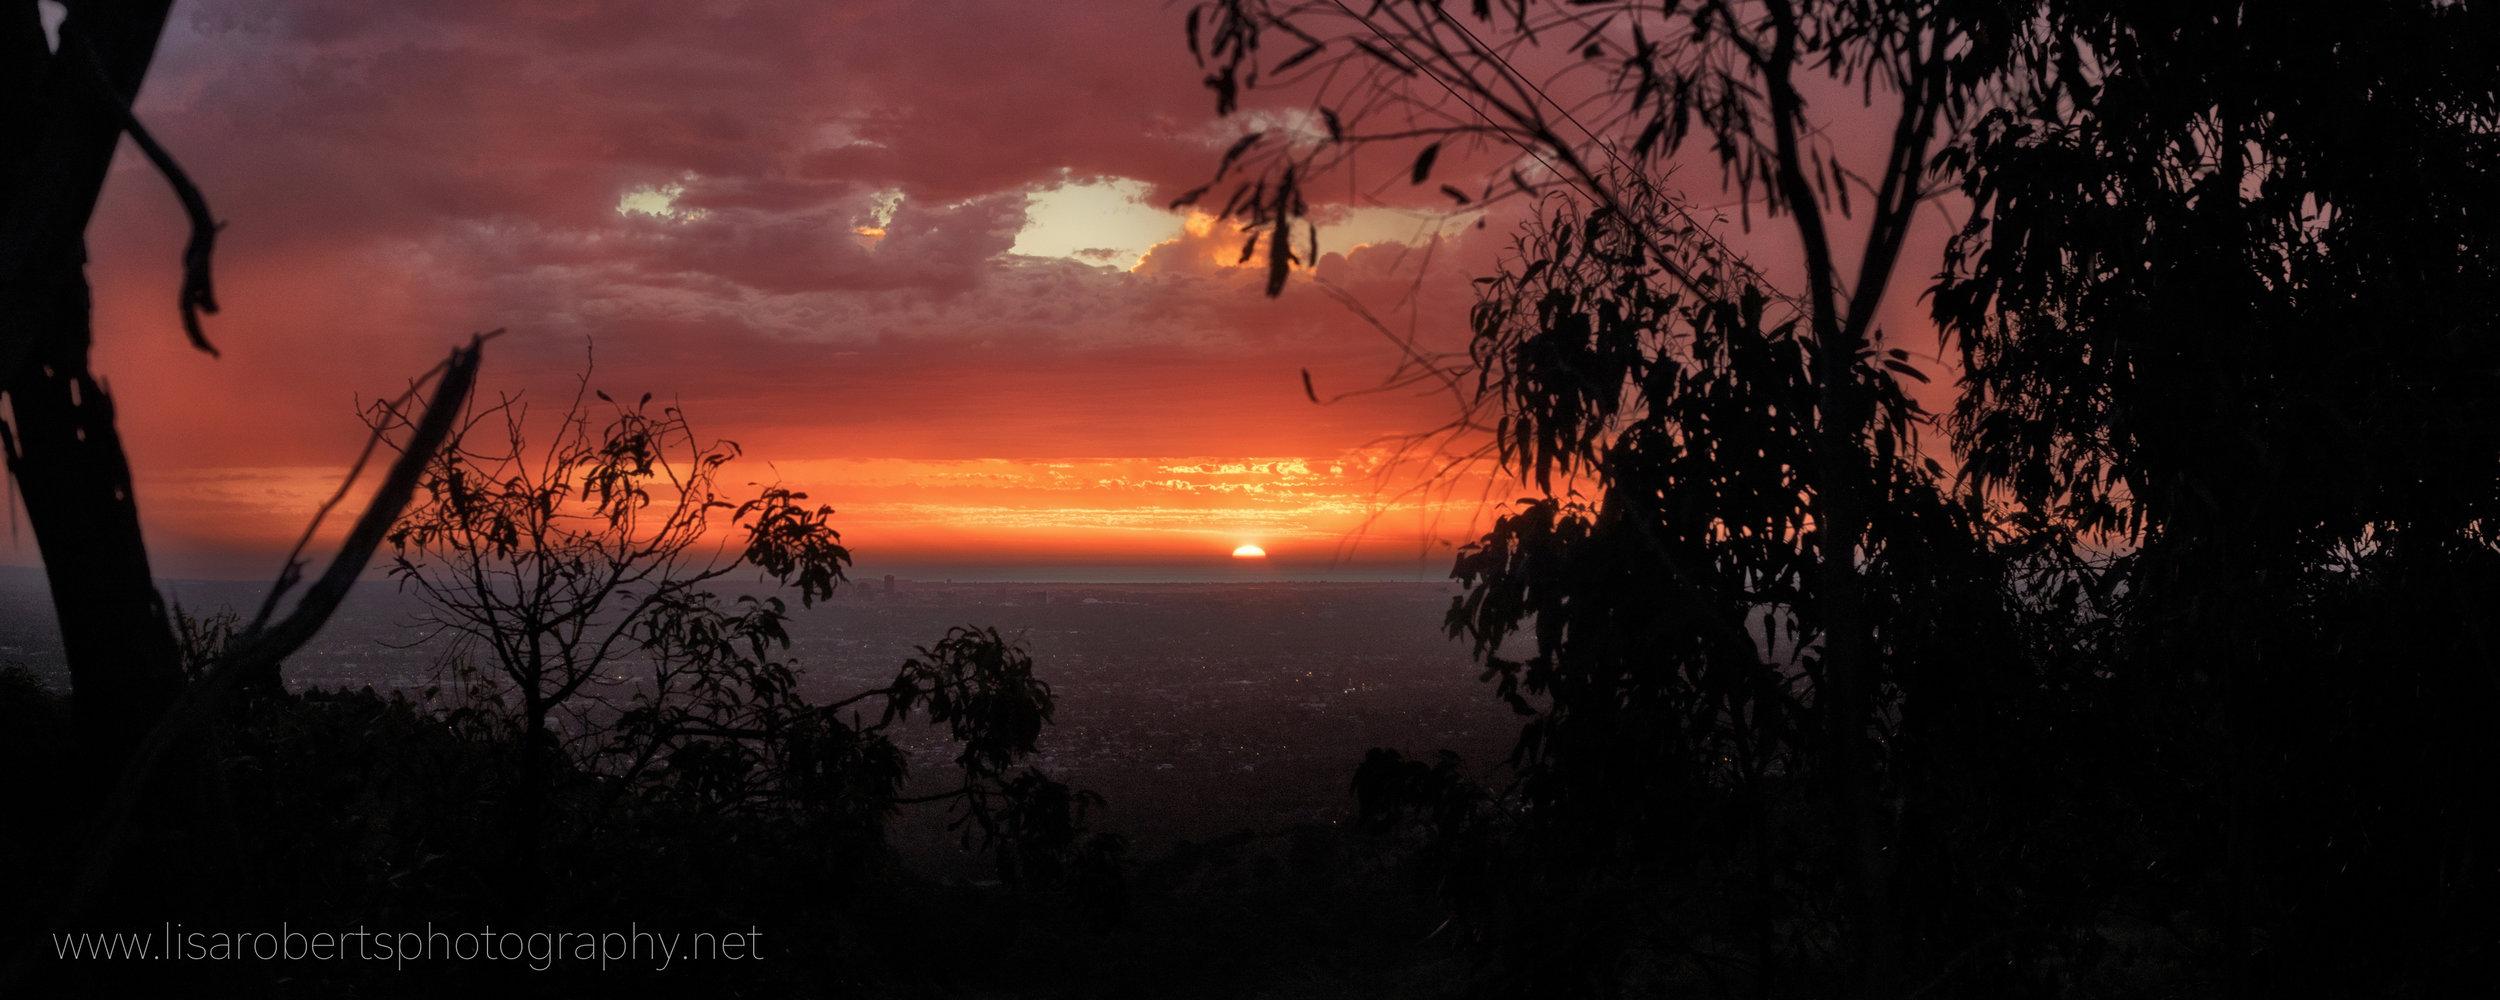 Sunset, Adelaide, South Australia